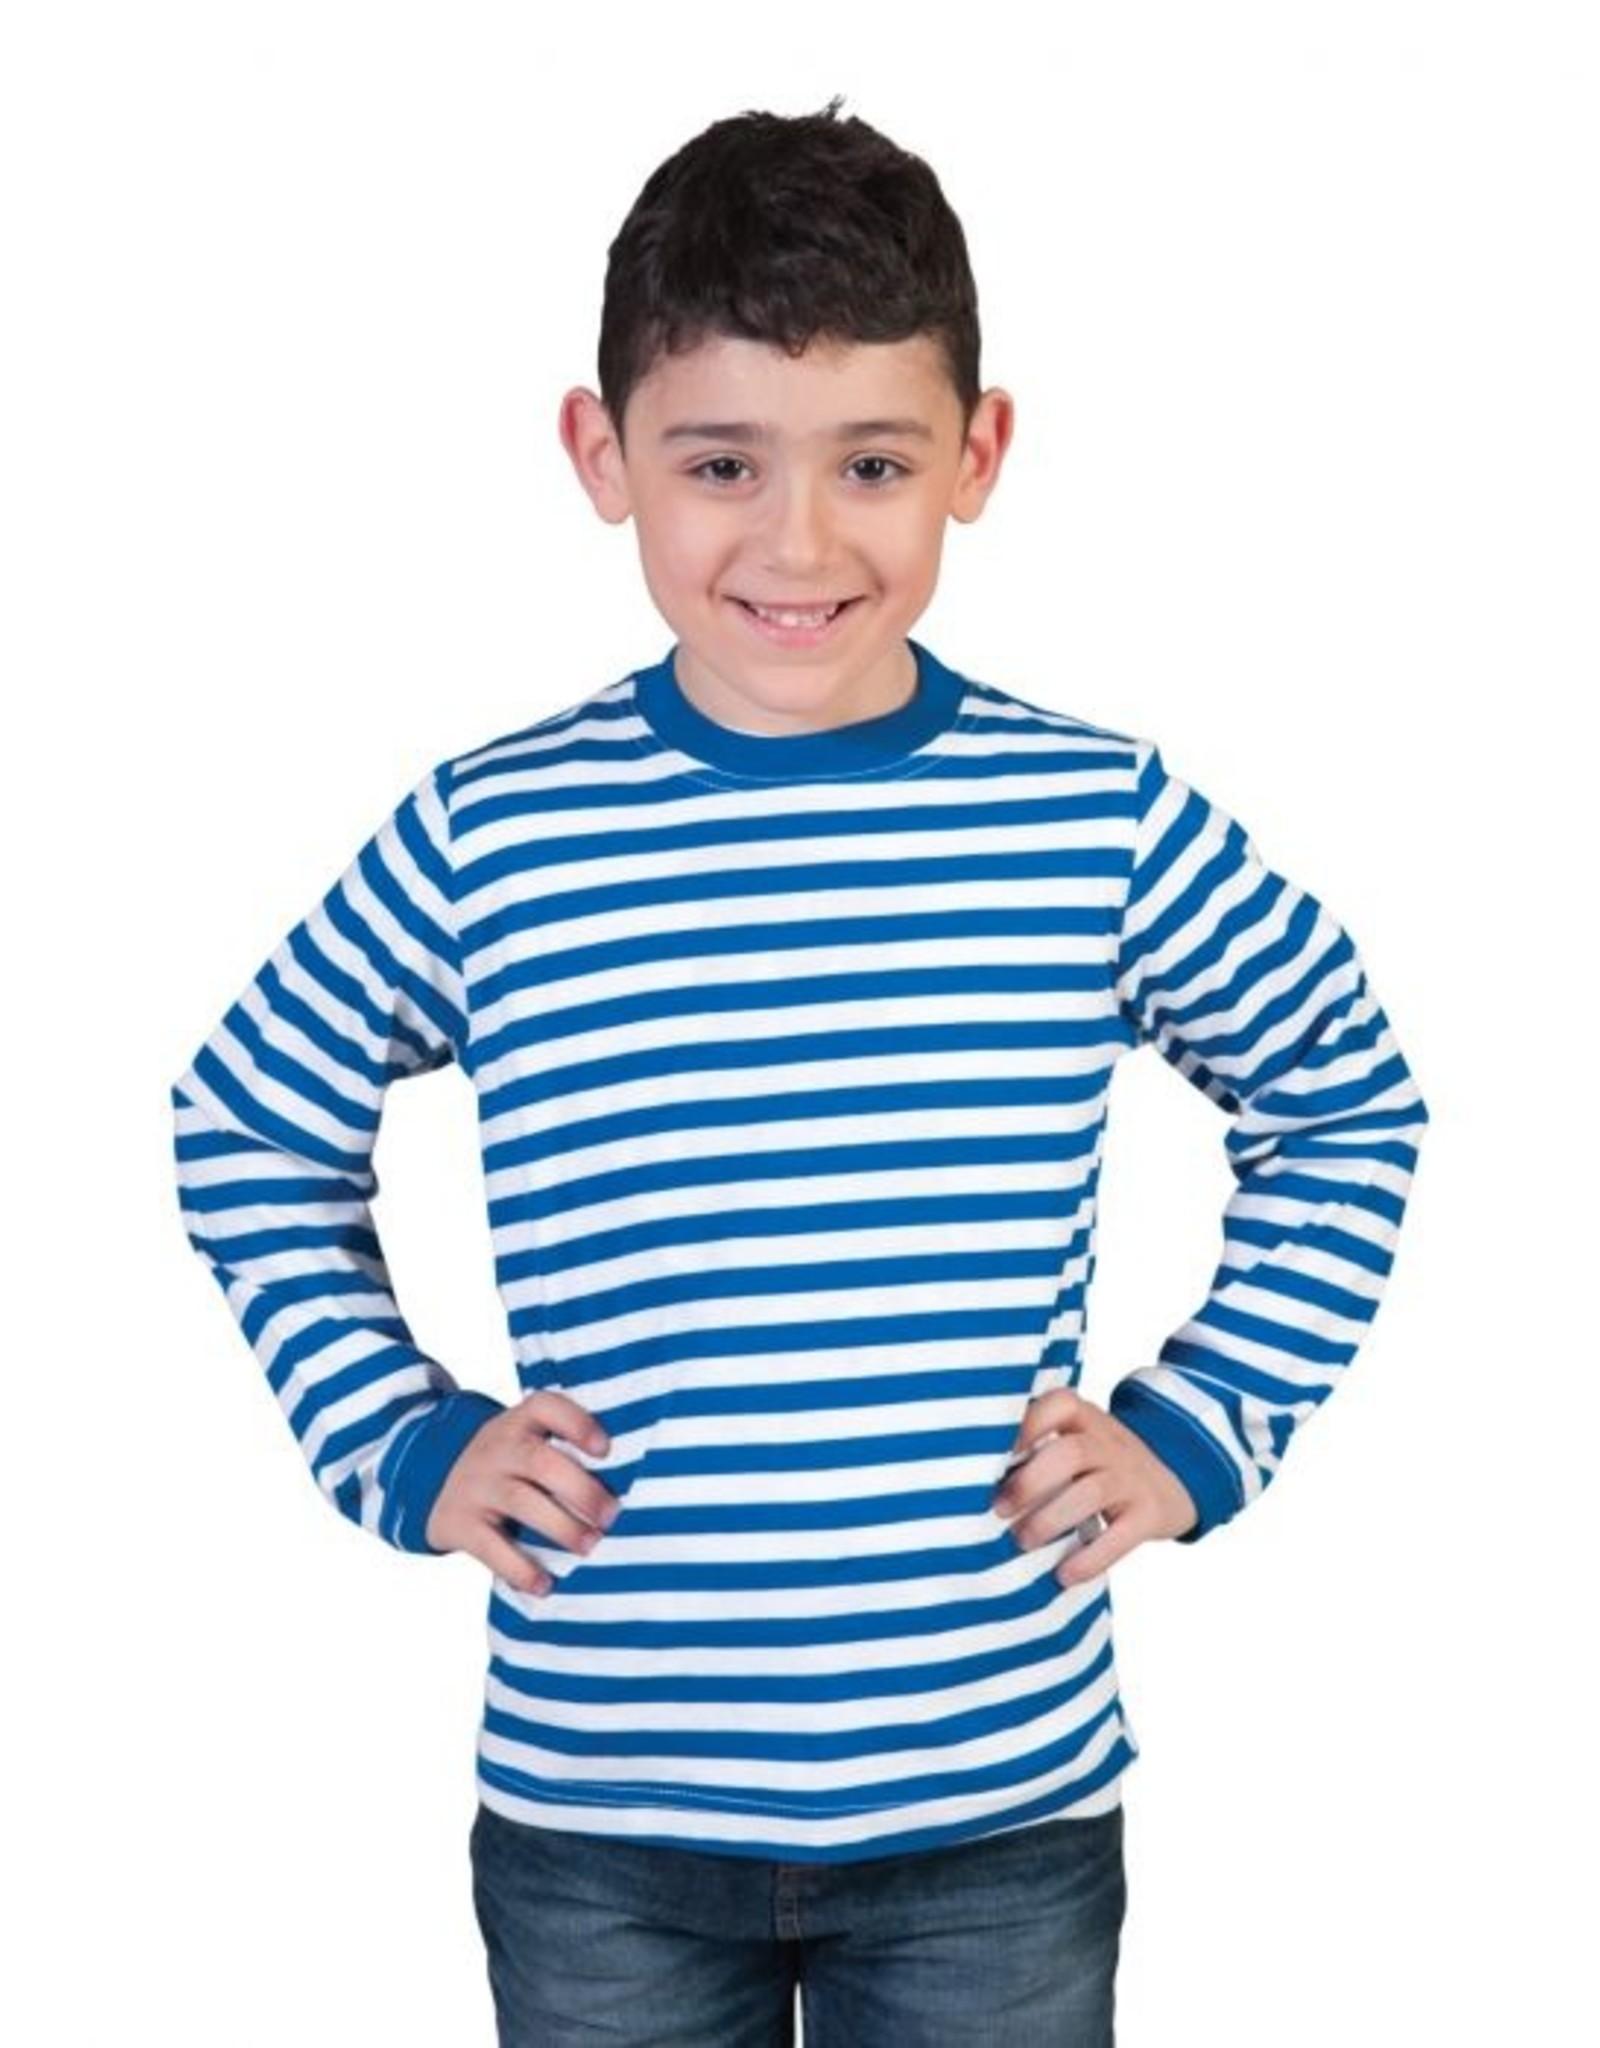 Funny Fashion Gestreepte trui blauw wit kind